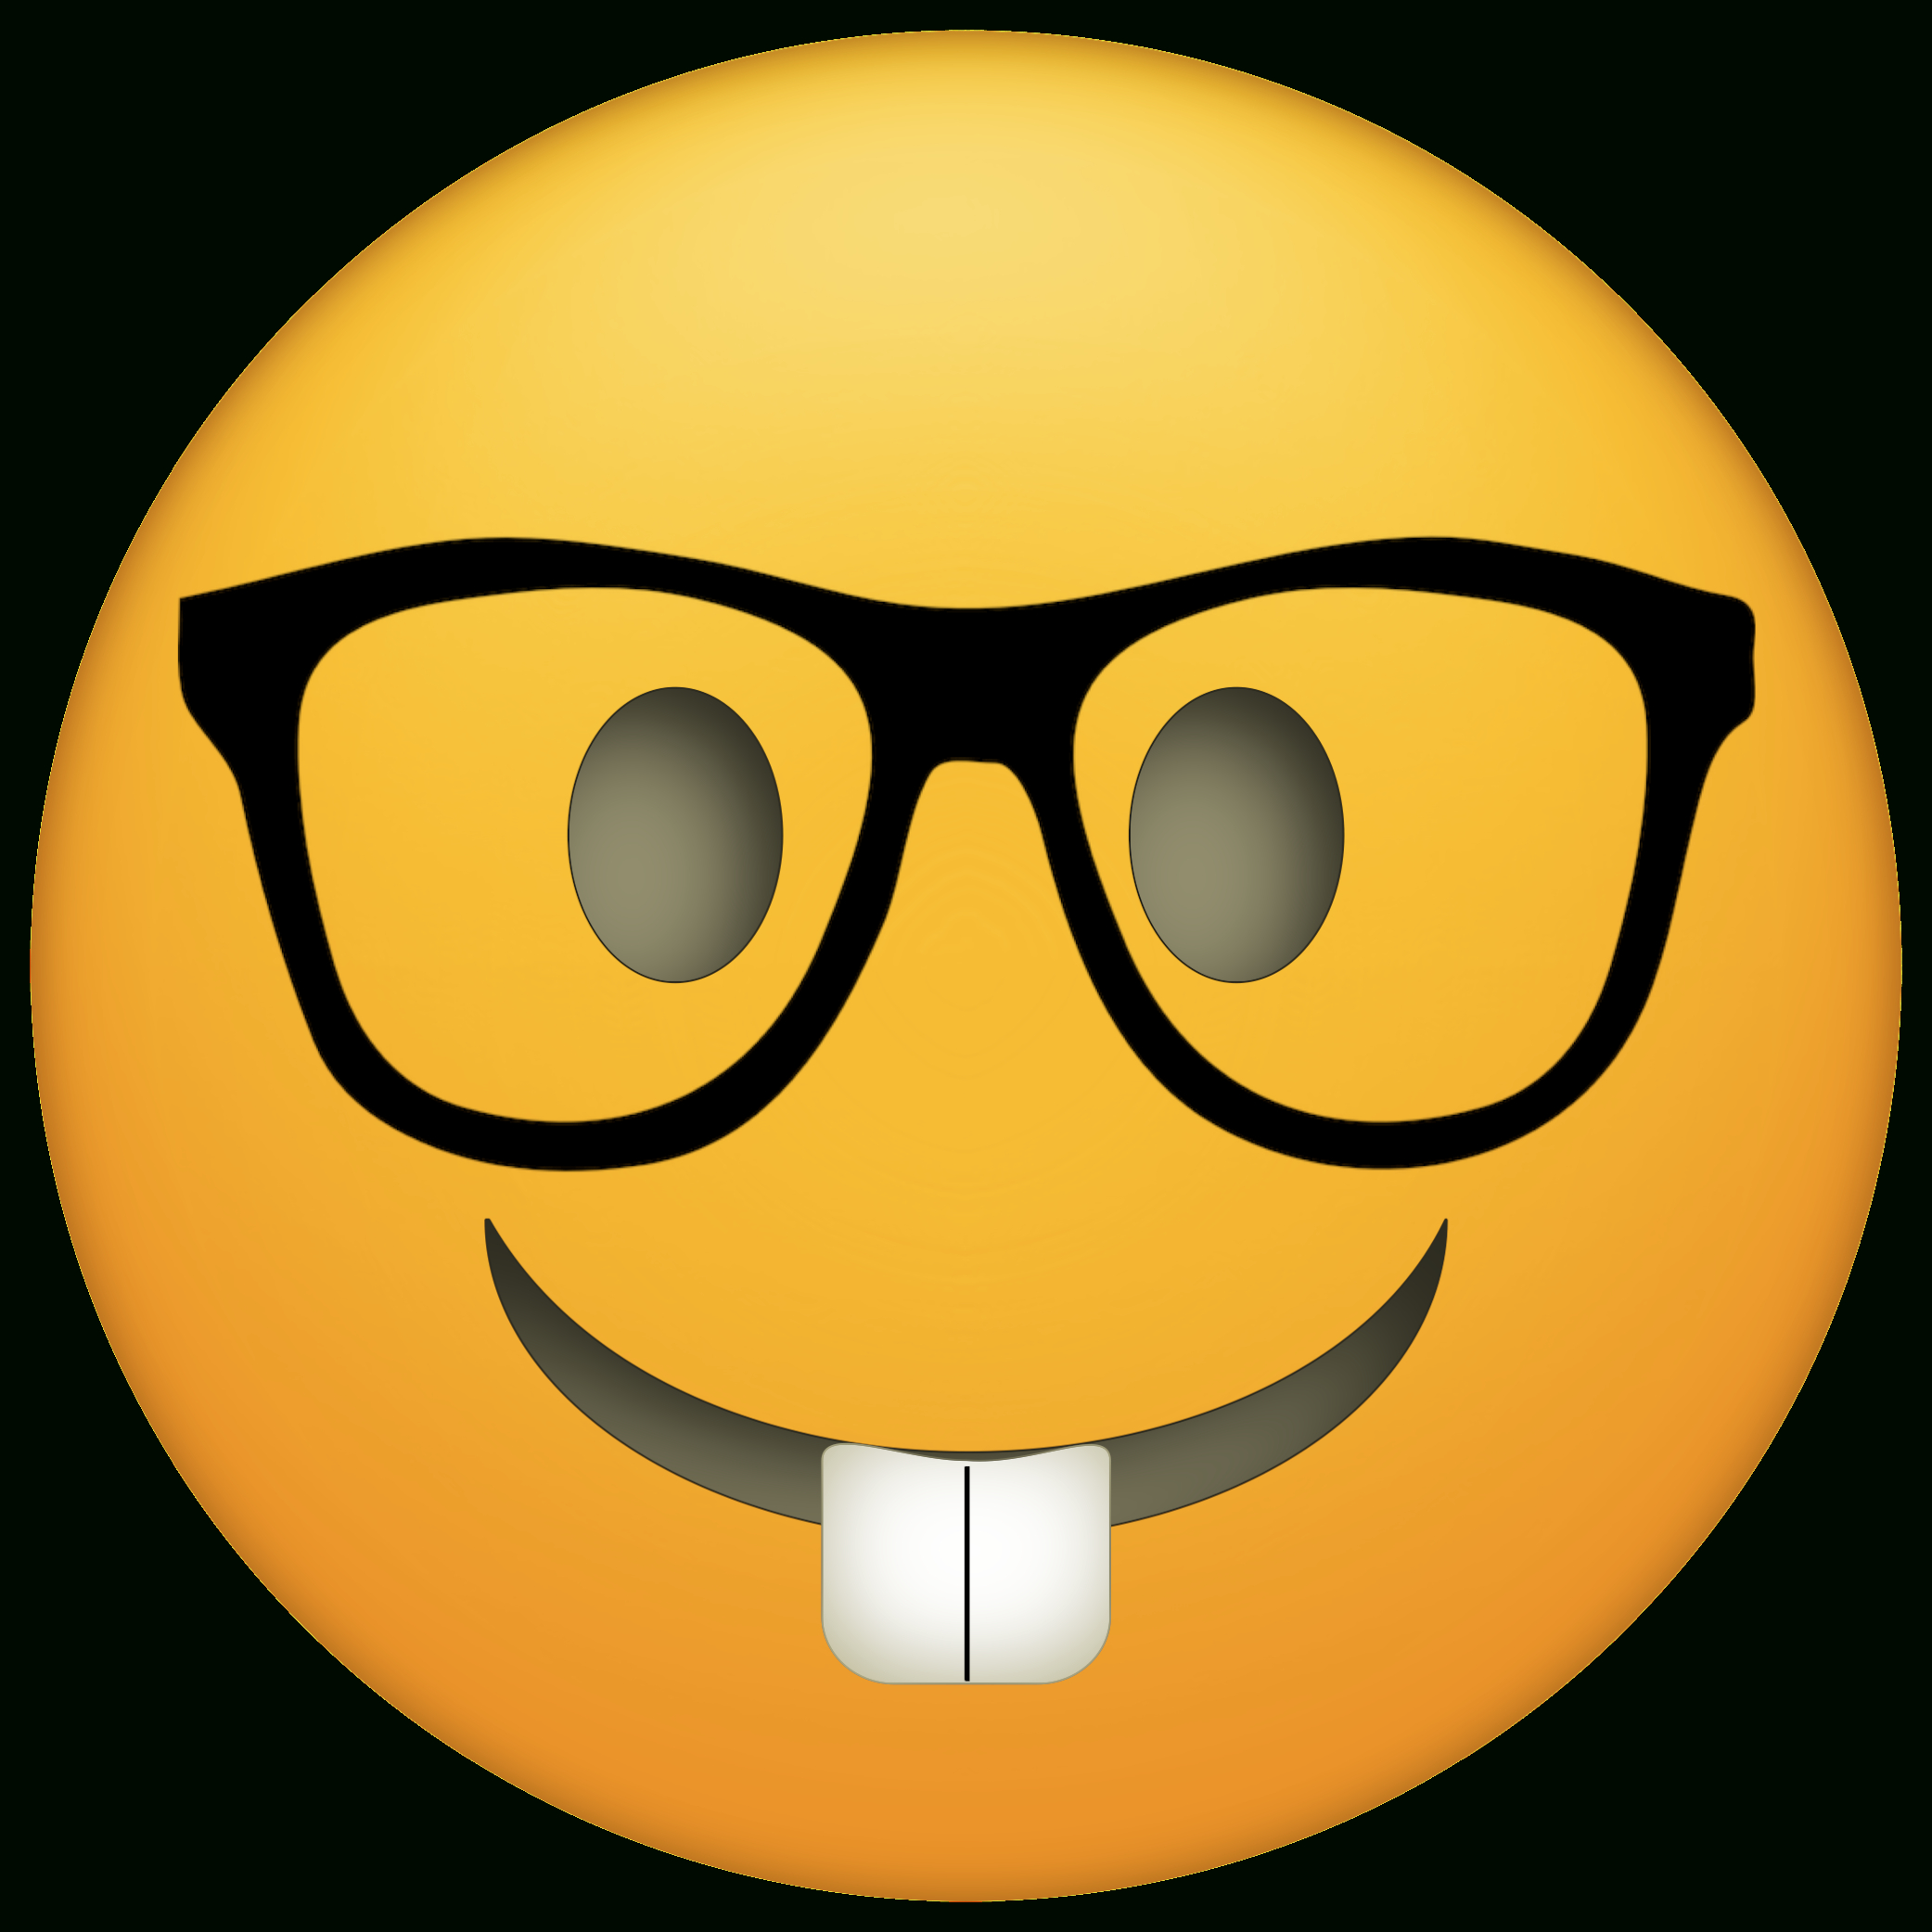 44 Awesome Printable Emojis | Kittybabylove - Free Printable Emoji Faces